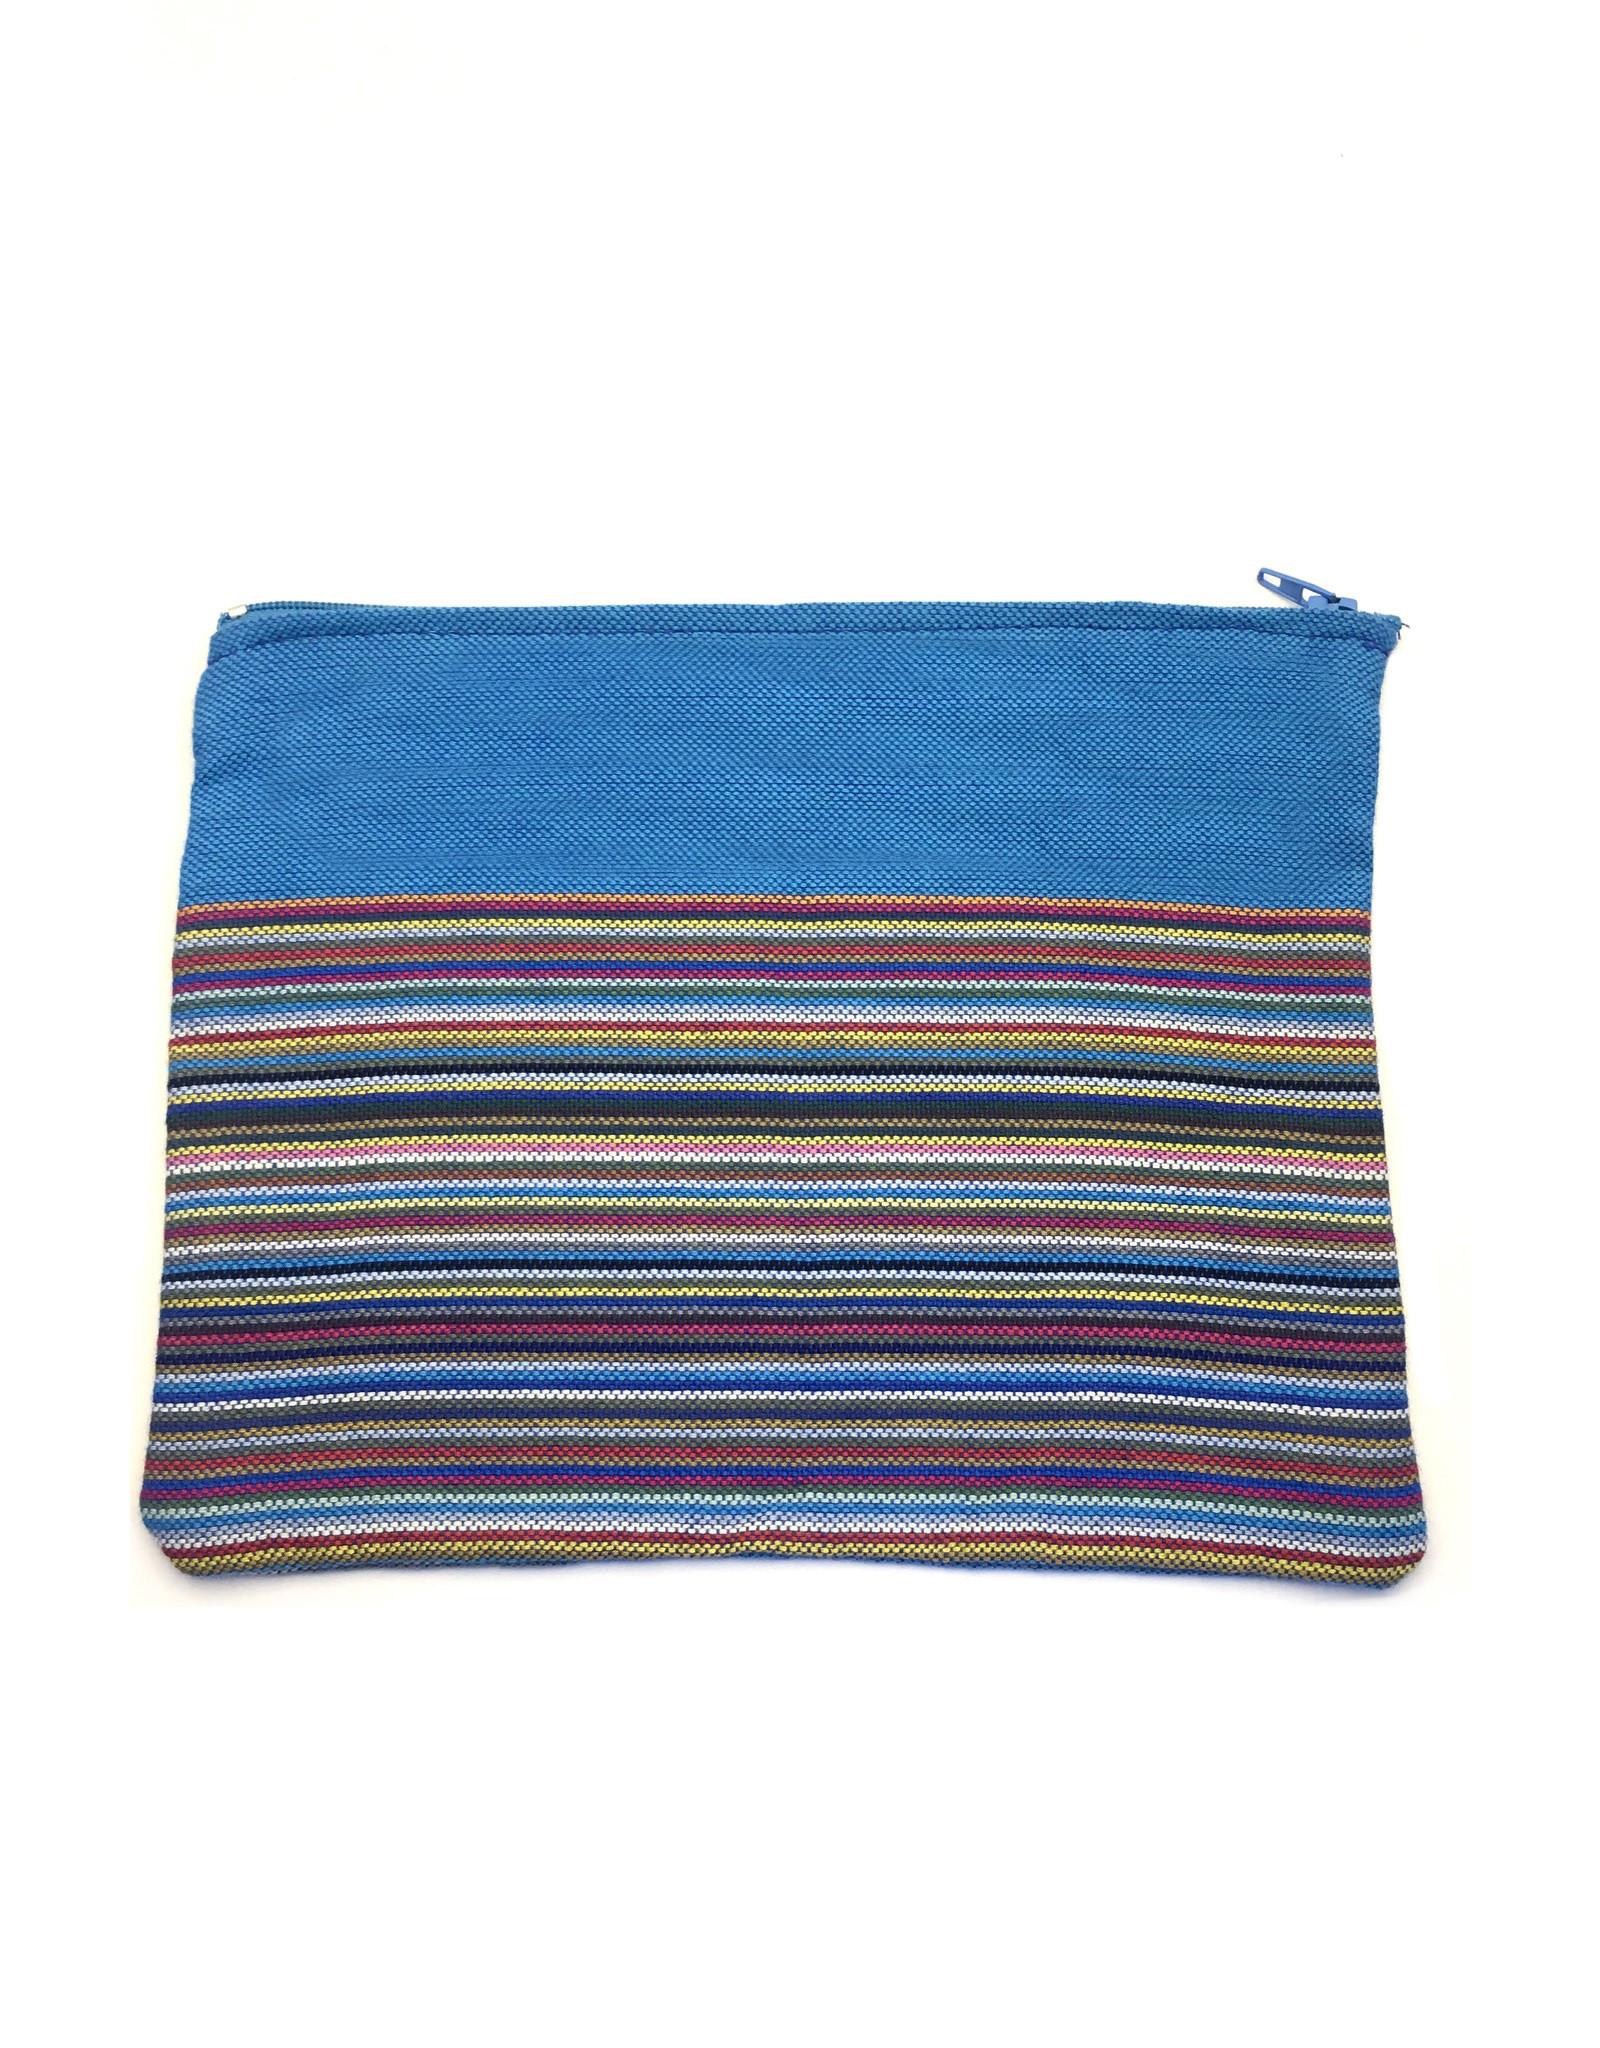 Maisha.Style Kikoy pouch - stripey mixed blue